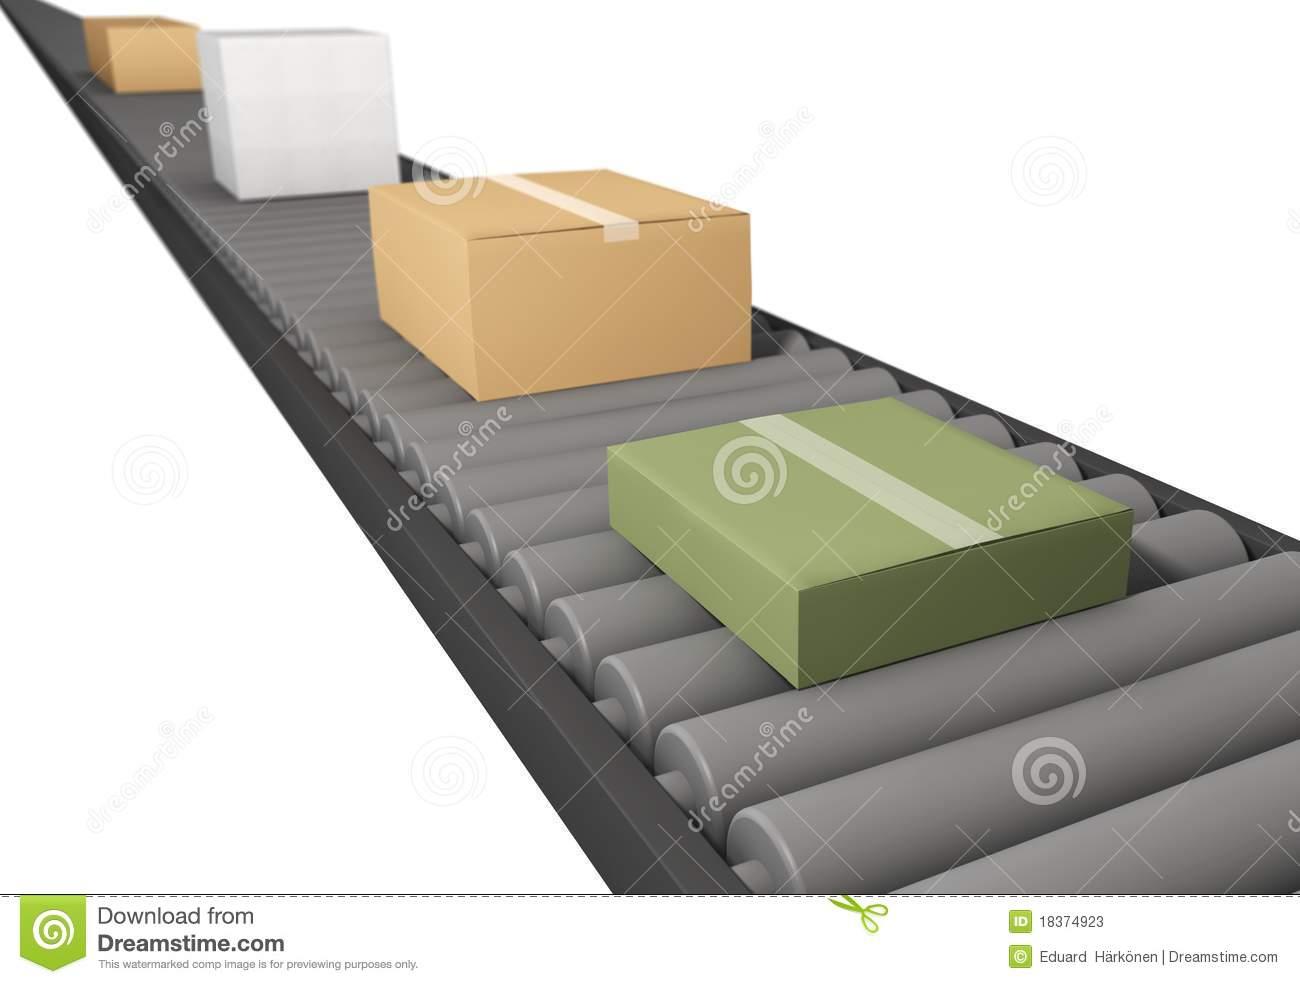 Clipart cartoon box on conveyor belt.